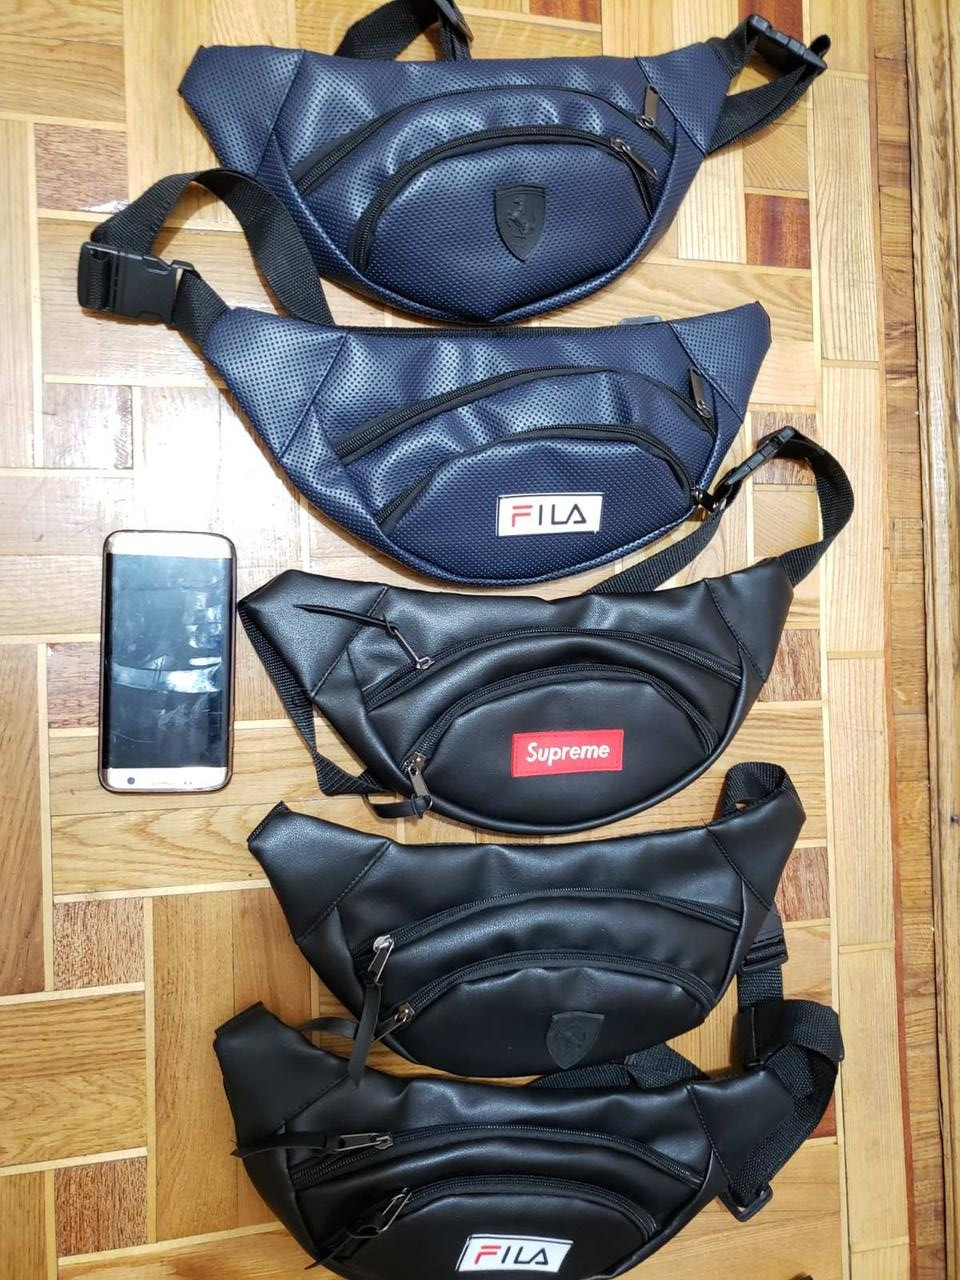 Сумка на пояс, бананка, поясная сумка из эко-кожа поясная сумочка FILA,supreme Размеры: 34x12x6cm